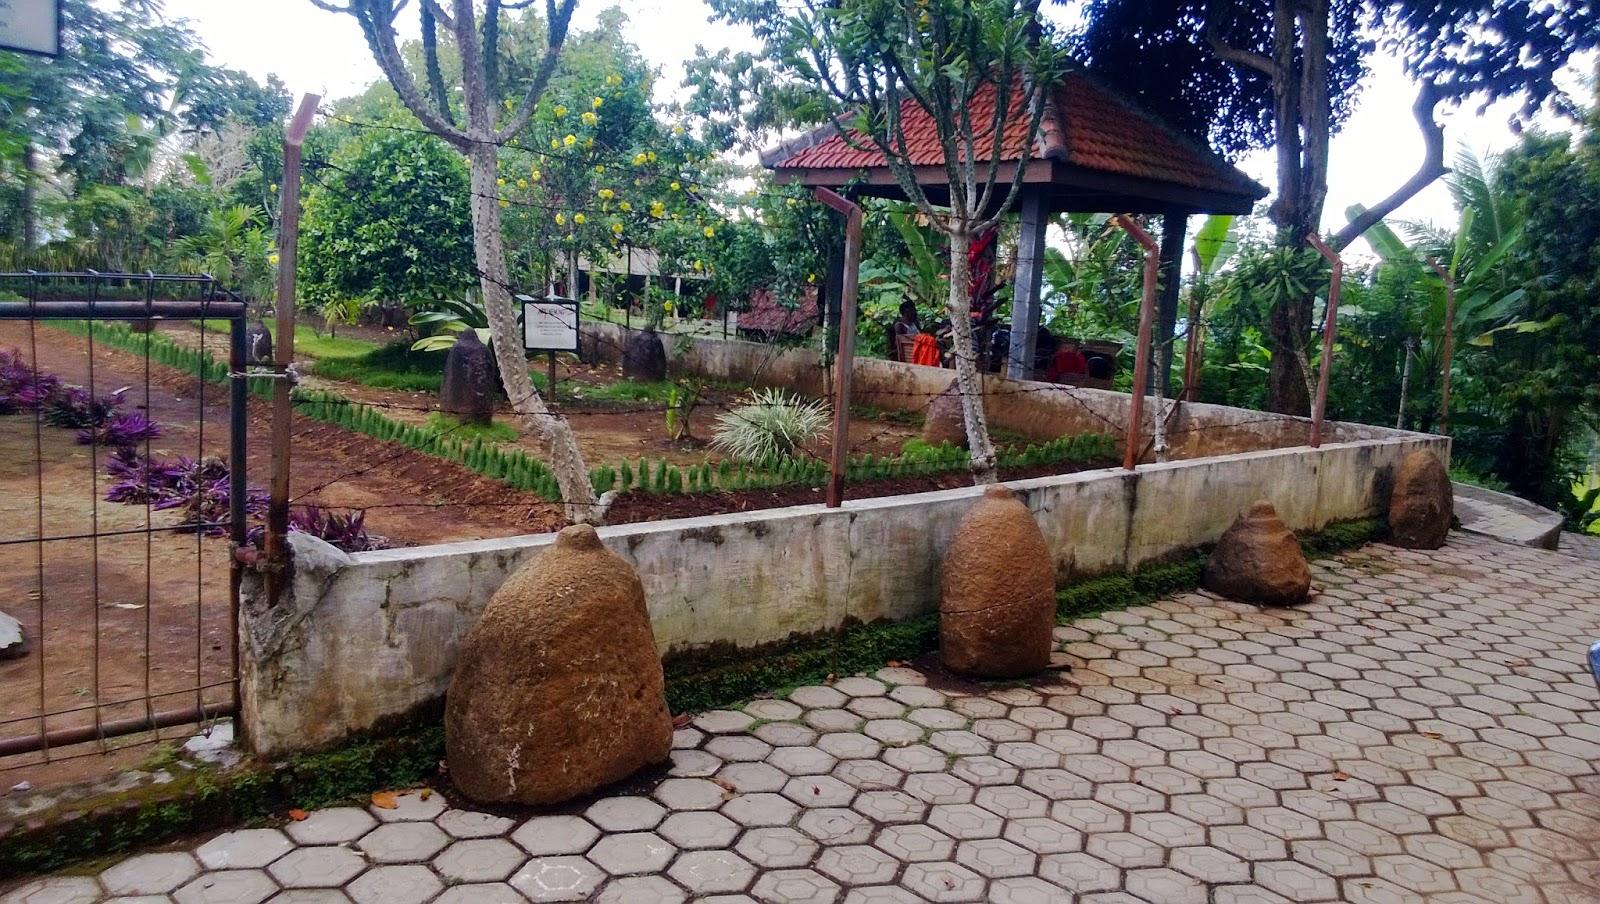 Bhattara Saptaprabhu Rekonstruksi Historisitas Jember Keterangan Foto Prasasti Congapan Karang